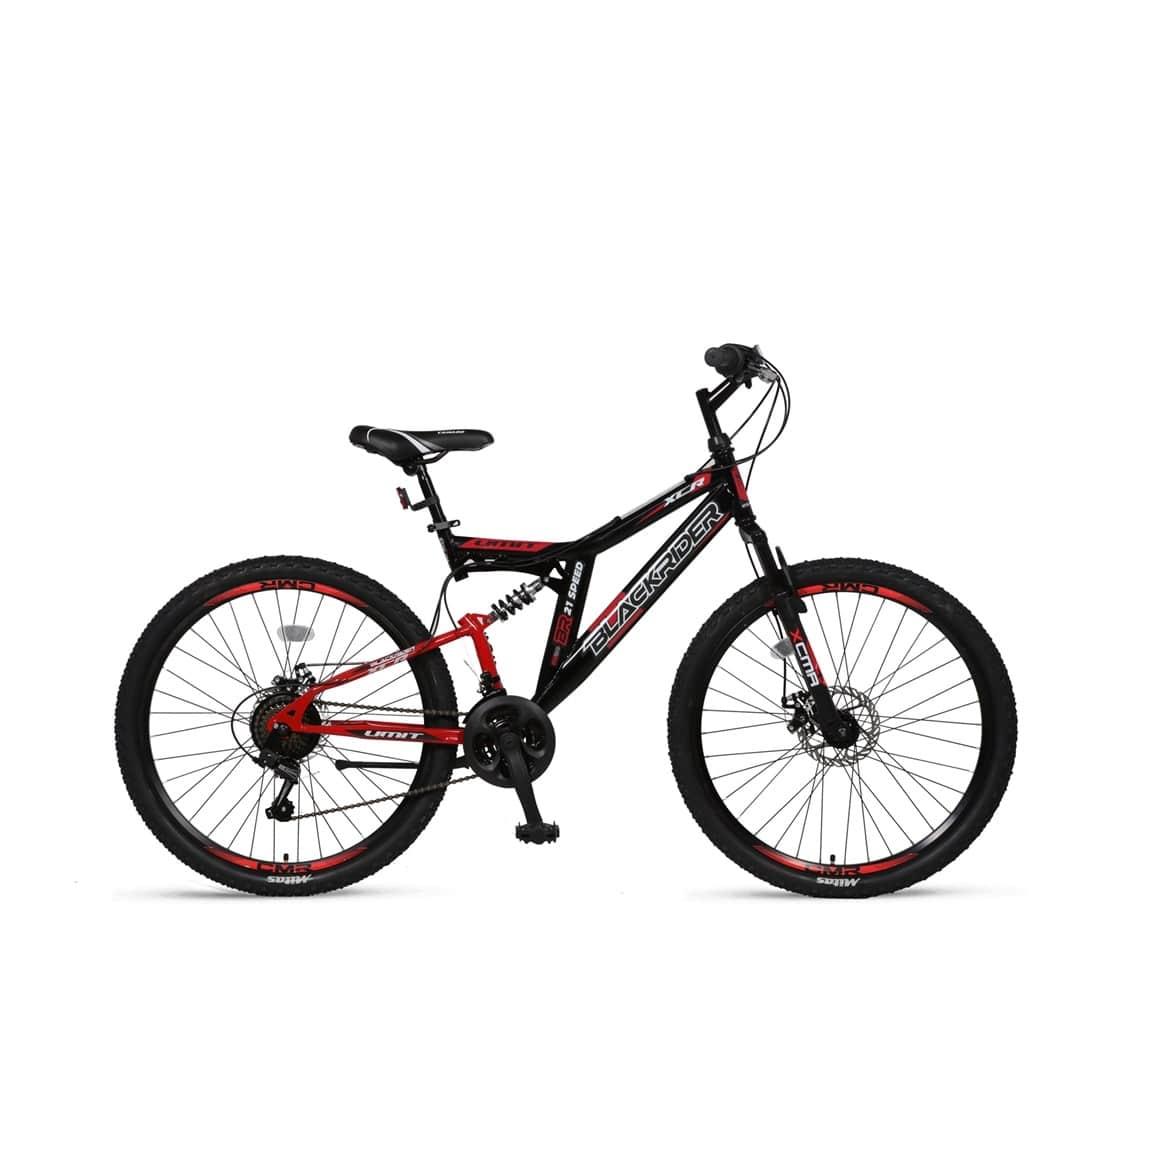 Umit-Black-Rider-26inch-MTB-Red-Black-Red-min